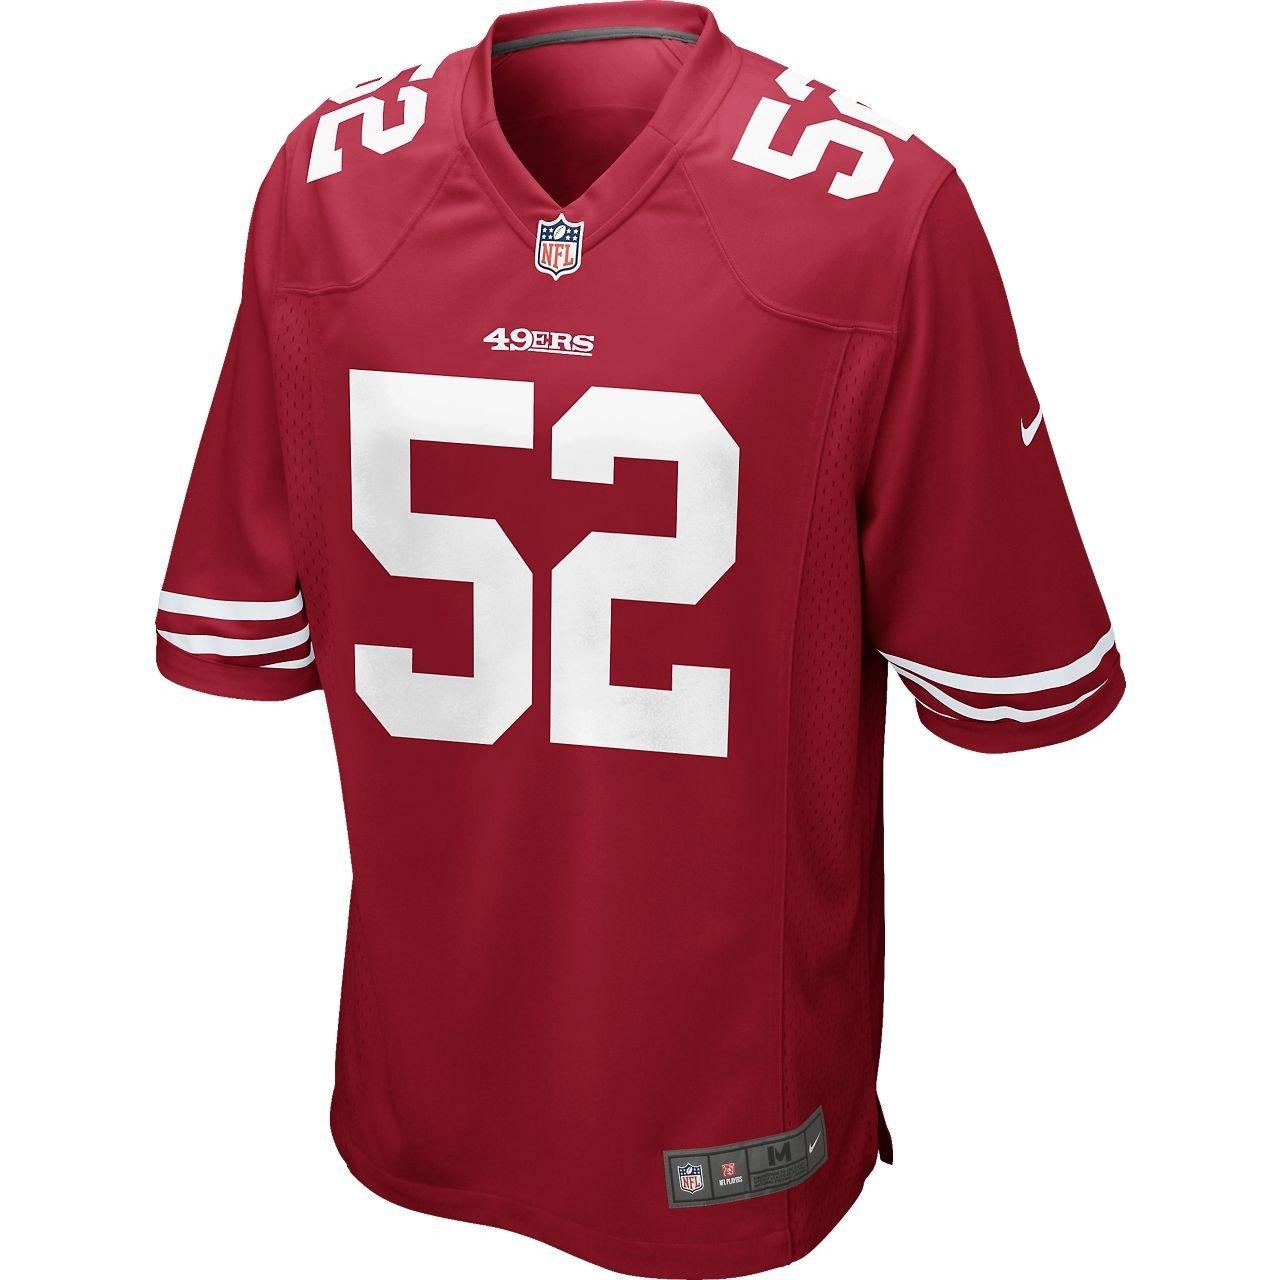 4b8916eba Nike Men s Patrick Willis San Francisco 49ers Game Jersey  Amazon.ca   Sports   Outdoors